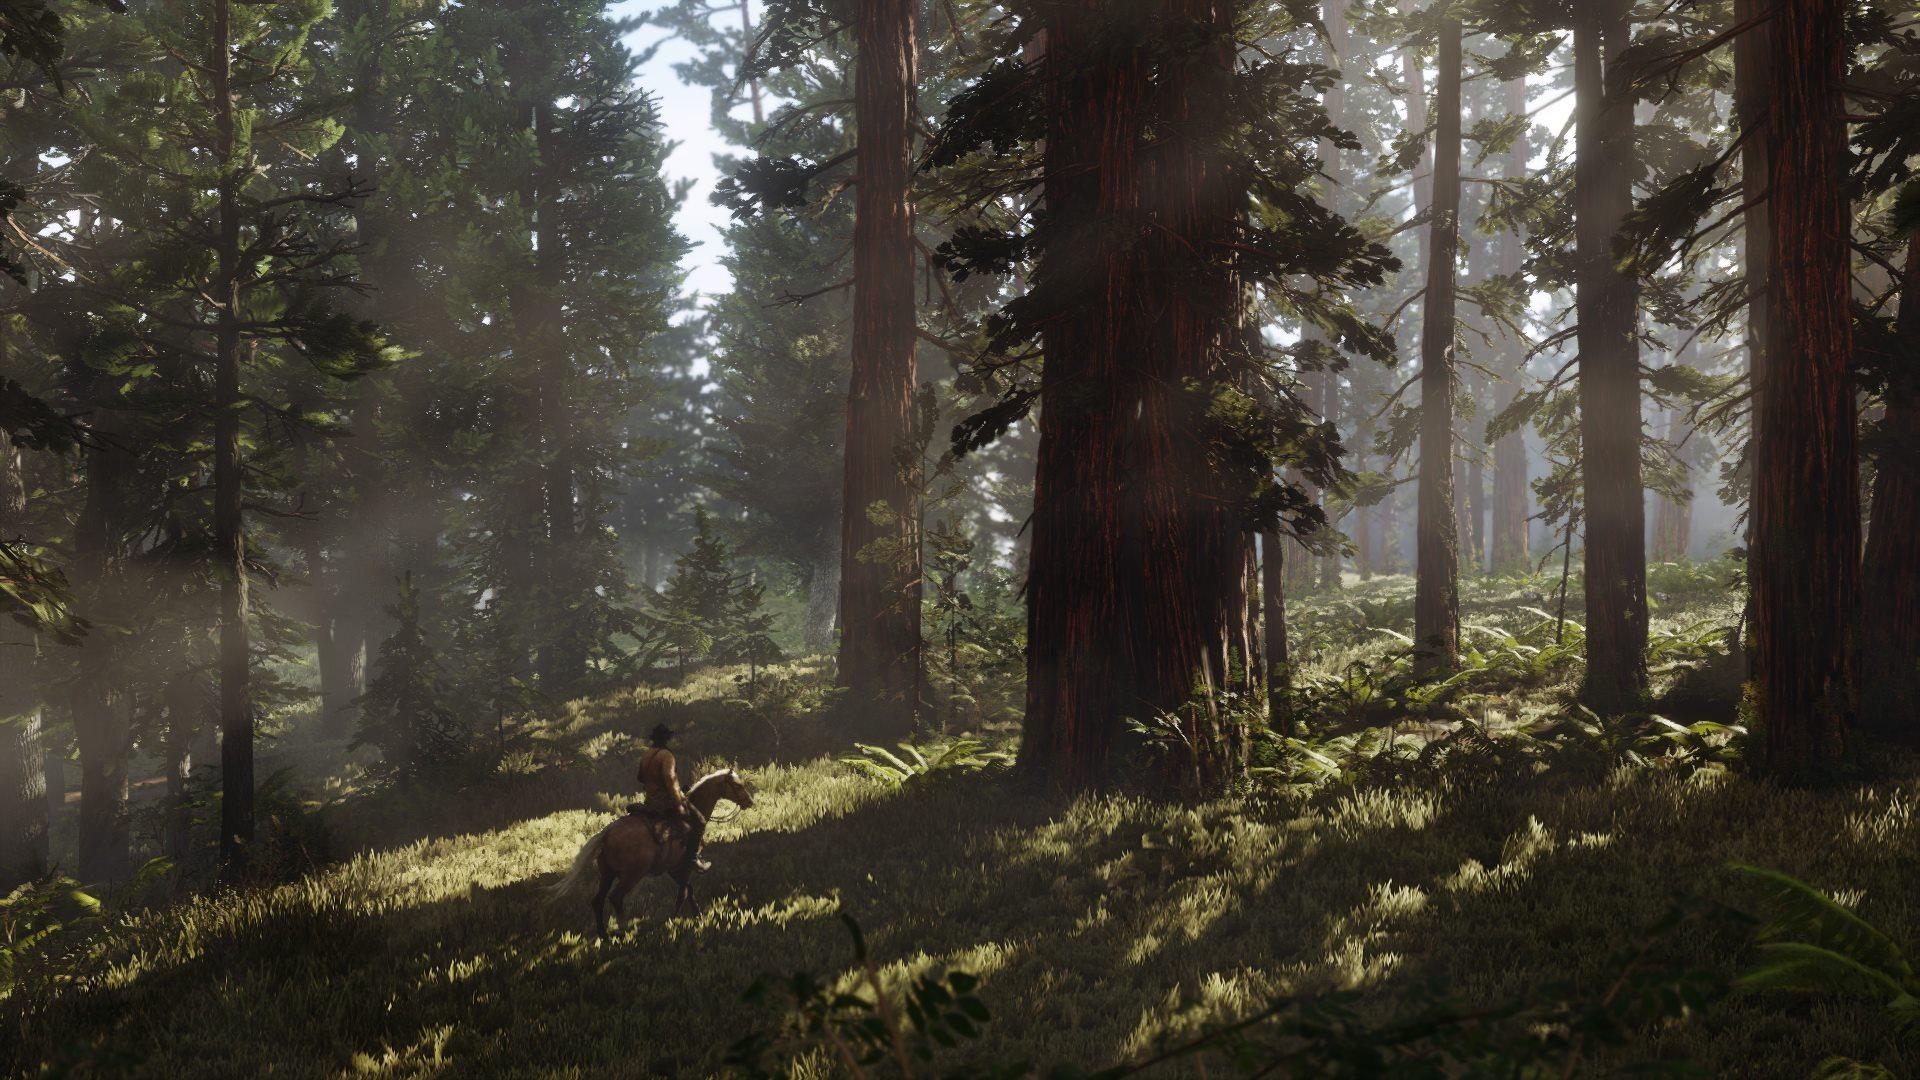 Rockstar adia Red Dead Redemption 2 para 2018 e pede desculpa